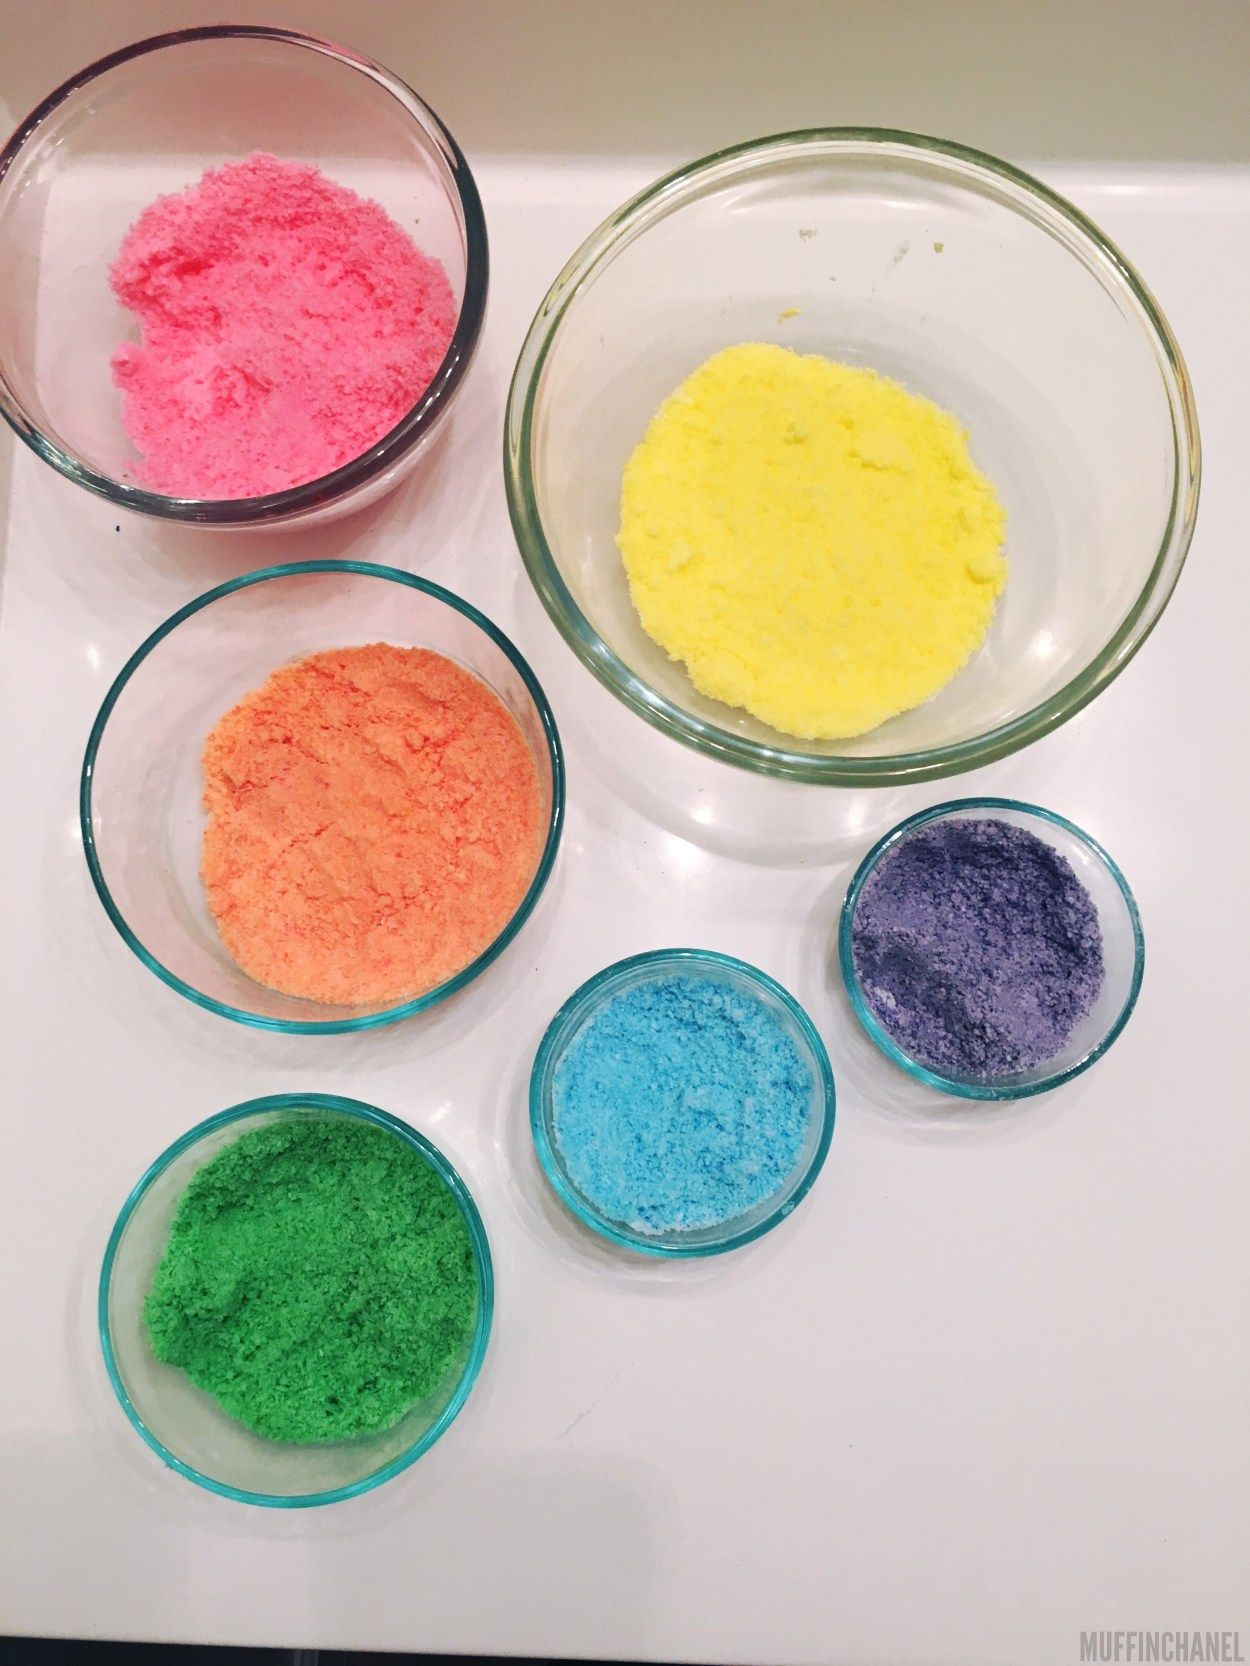 Make Your Own Bath Bombs Lush Inspired Muffinchanel Lush